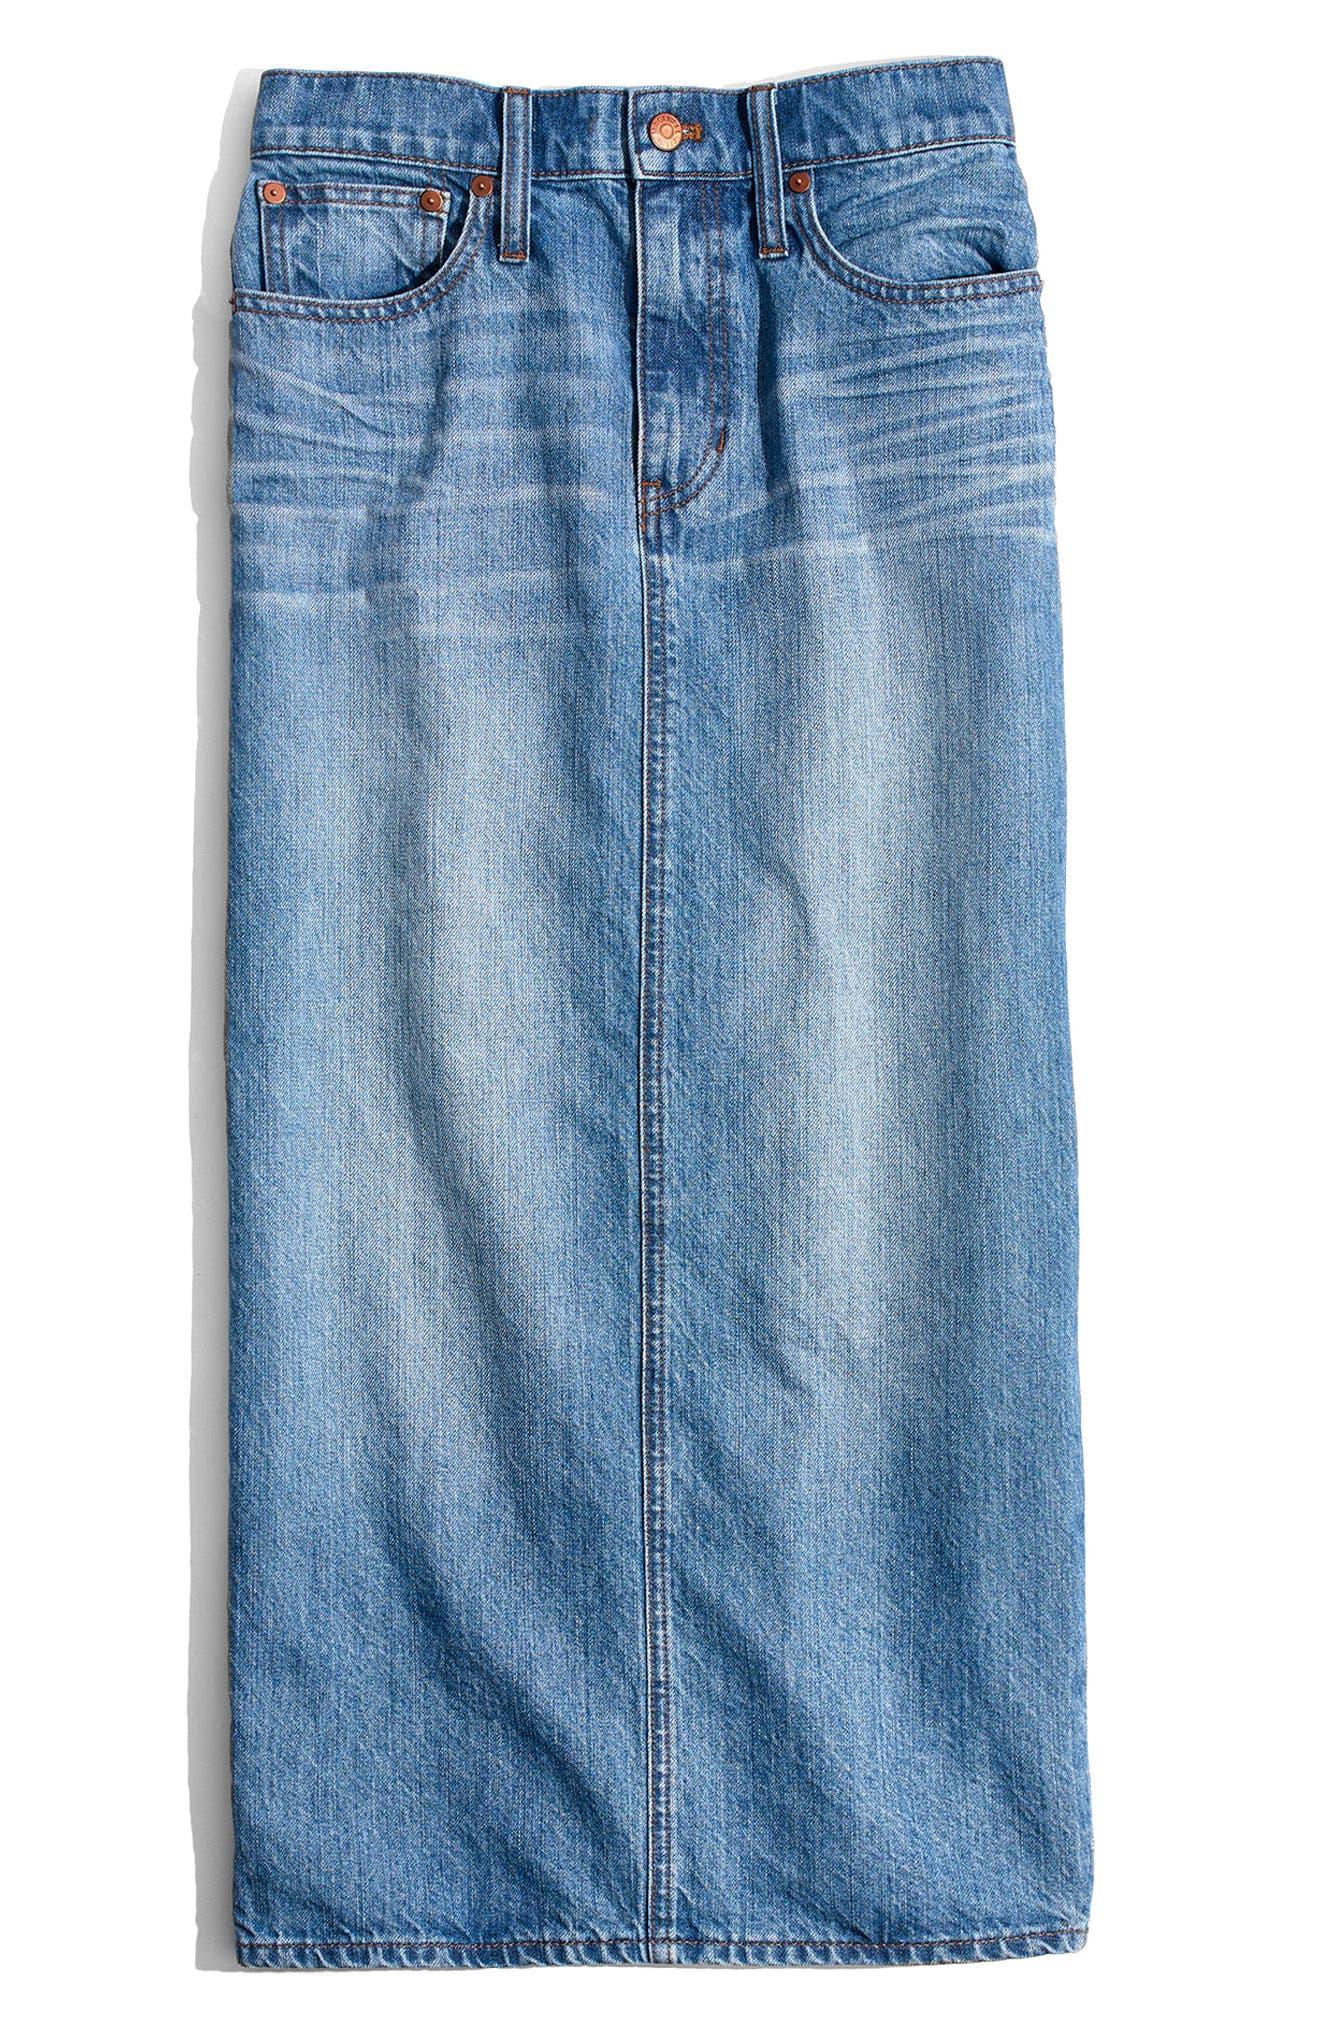 Madewell Denim Midi Skirt